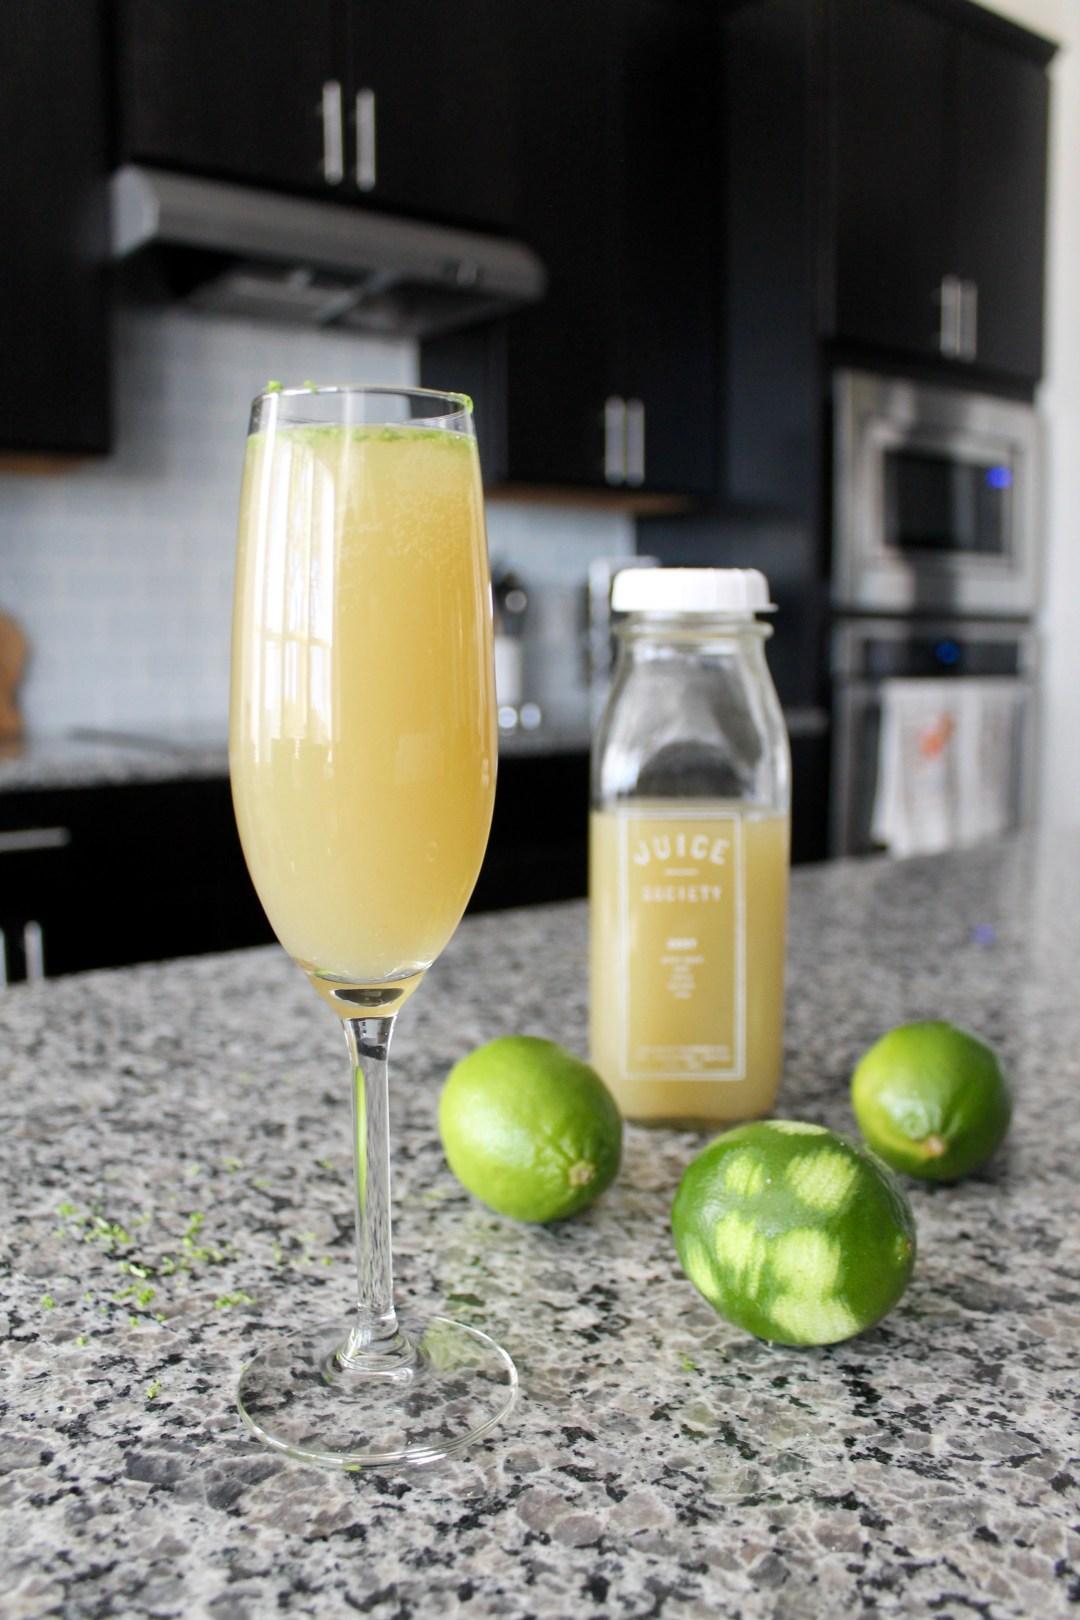 Zest Juice Society